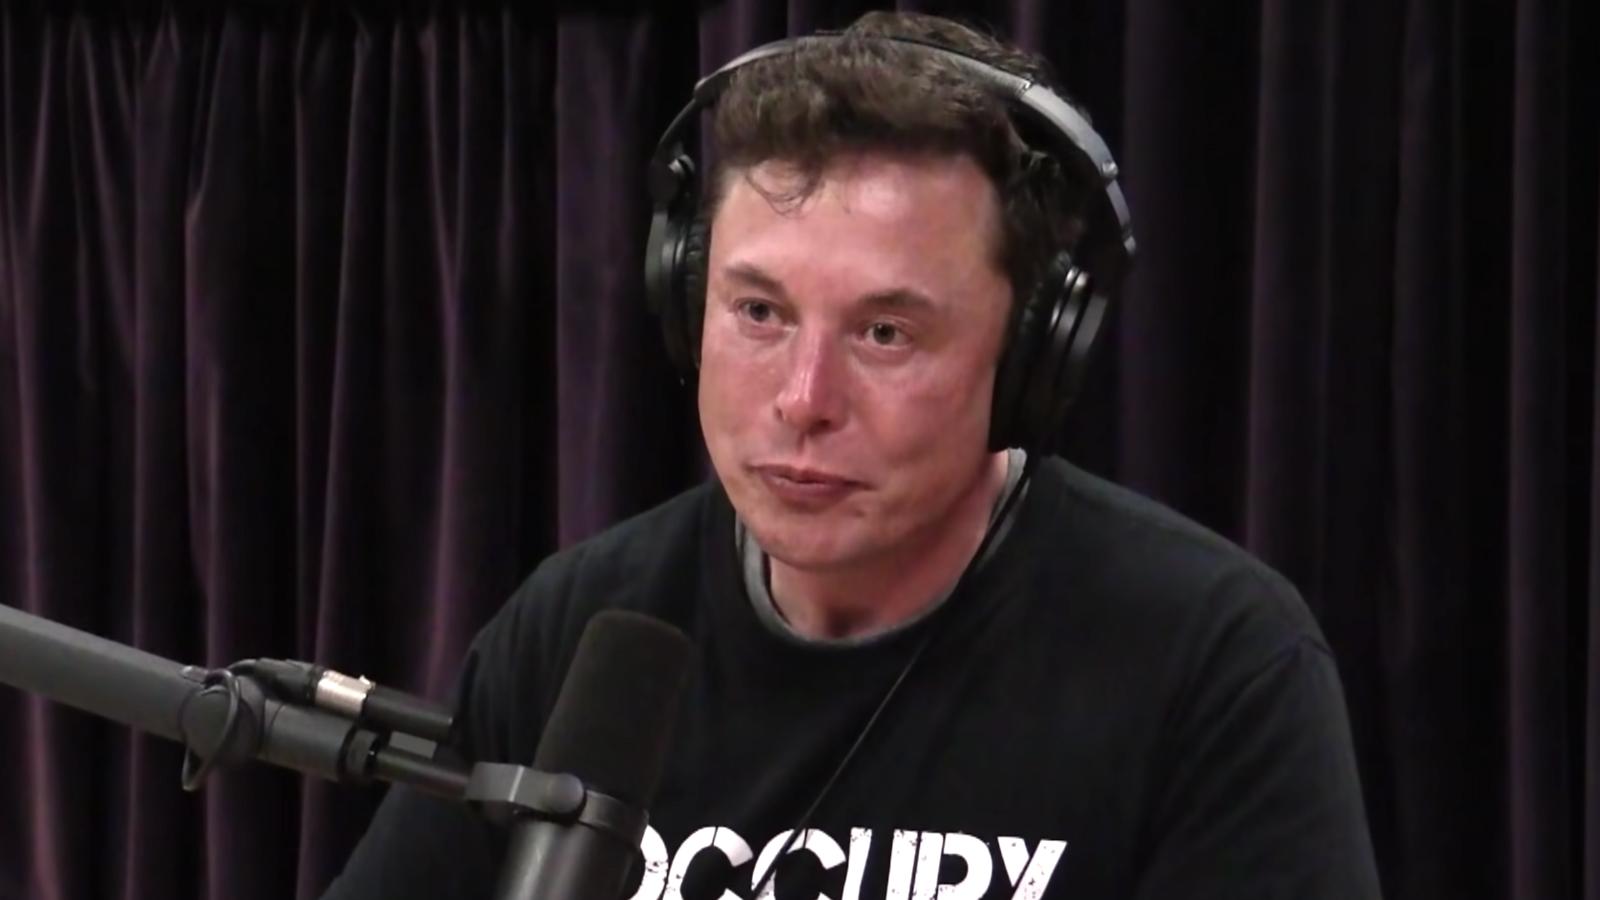 Elon Musk sitting on Joe Rogan's podcast in black t-shirt with headphones on.